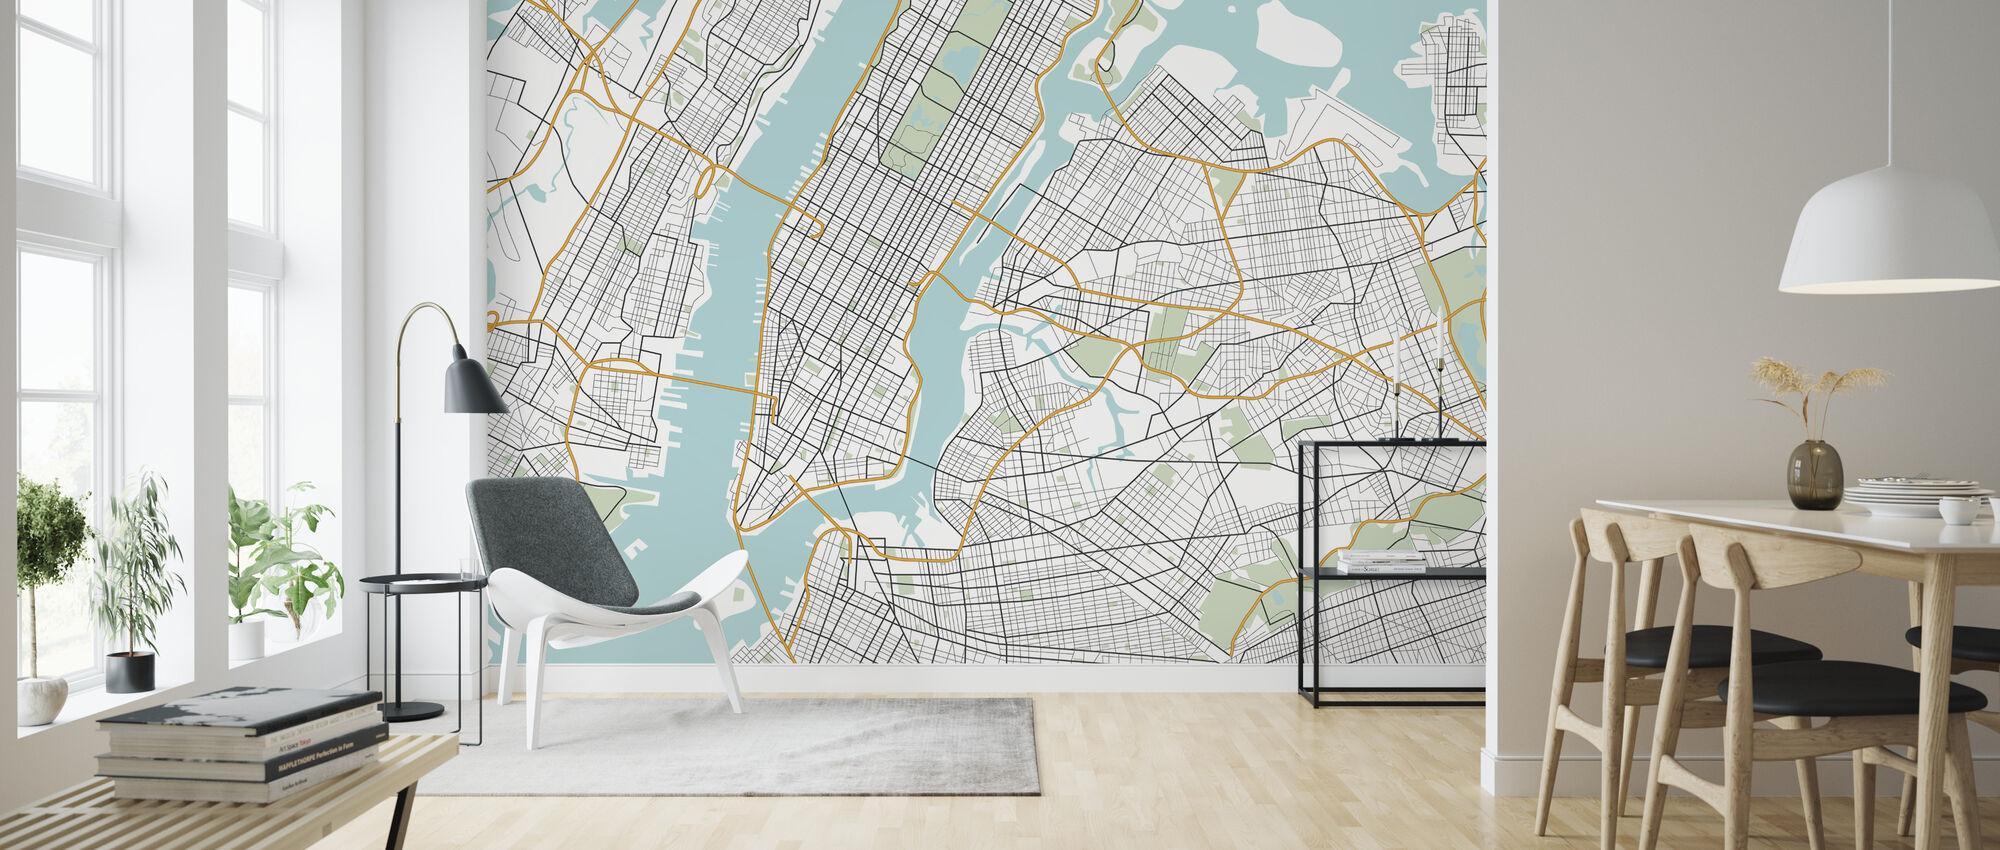 New York Karta - Tapet - Vardagsrum